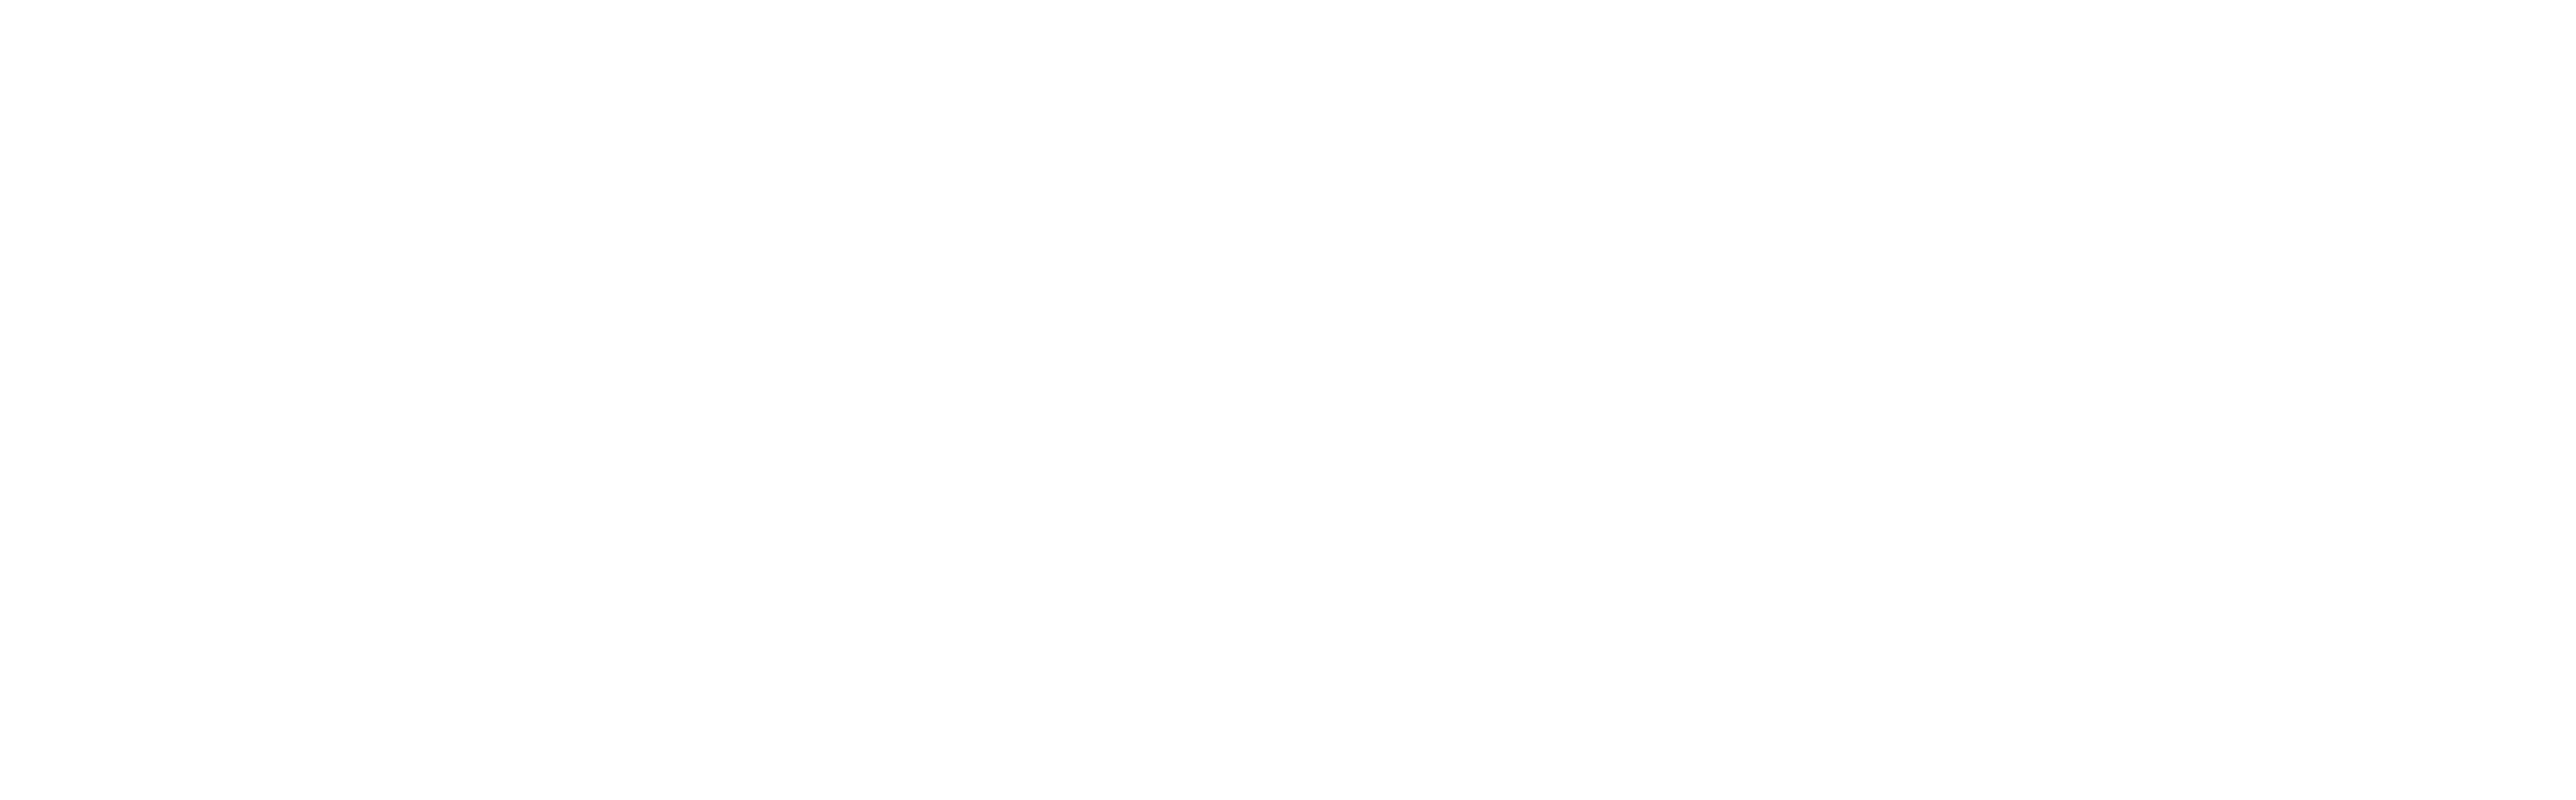 StartupNorway-Negative_StartupNorway-Negative